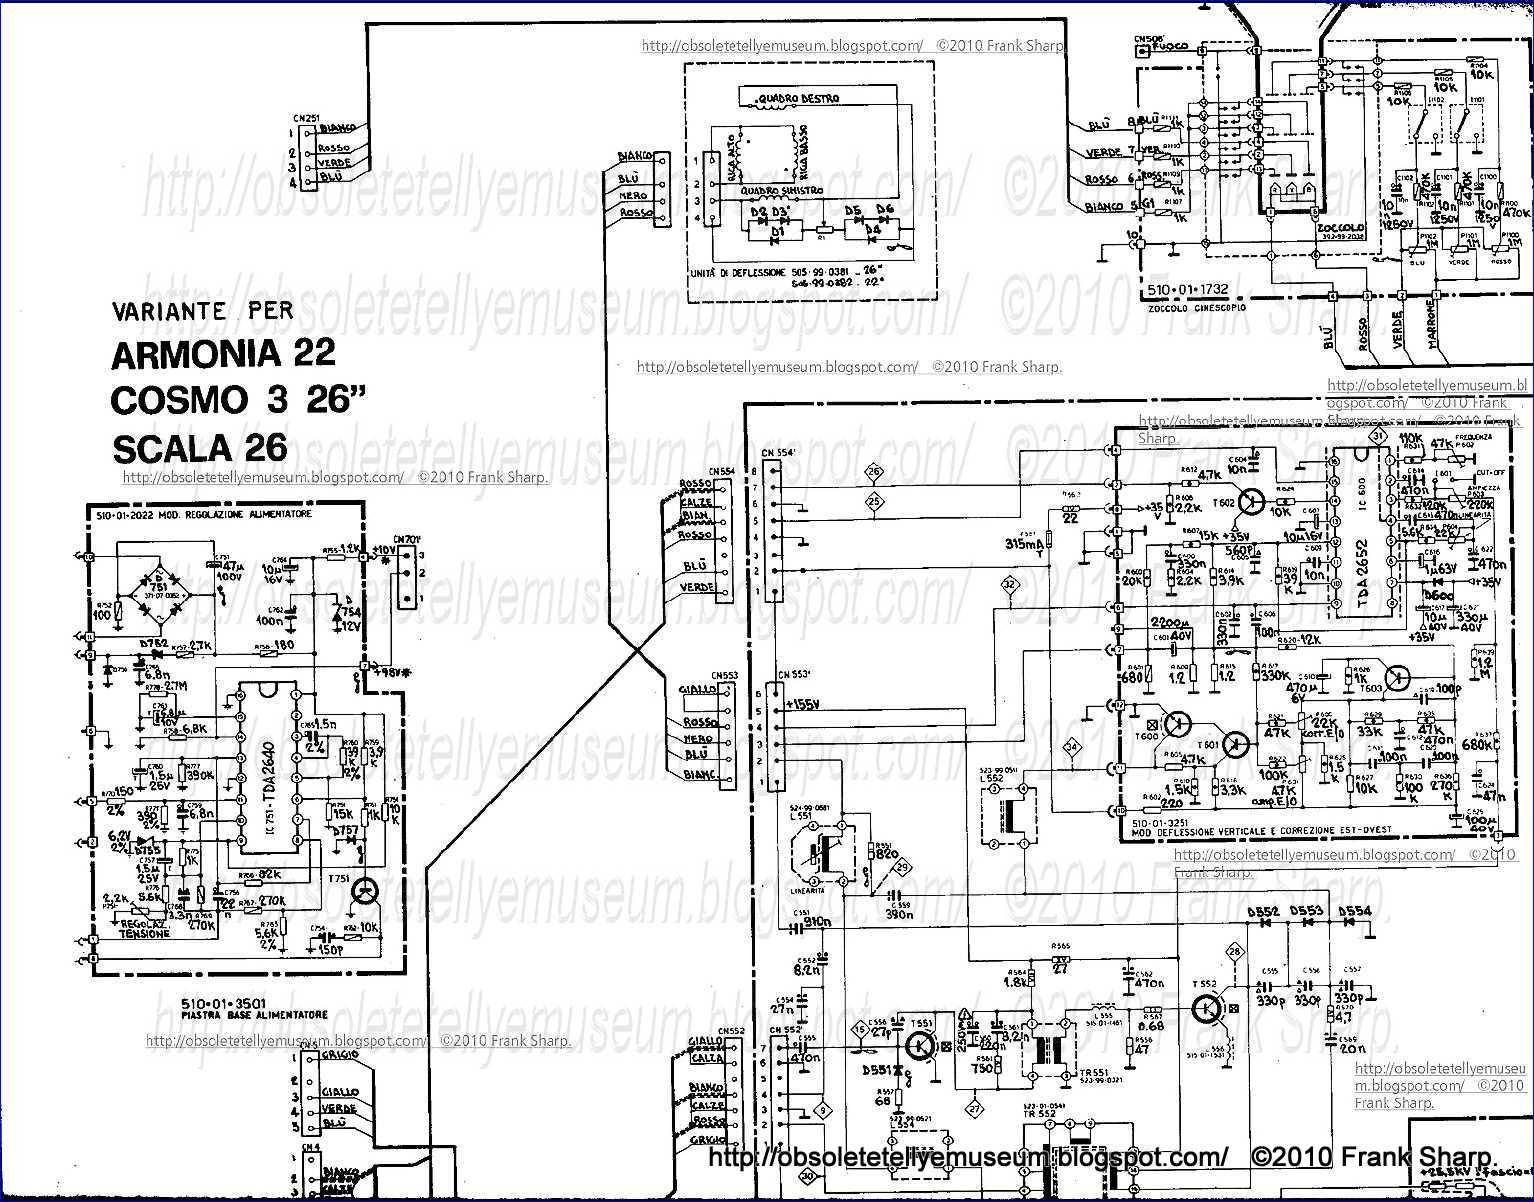 Berühmt 3 Wege Dimmerdiagramm Bilder - Schaltplan Serie Circuit ...